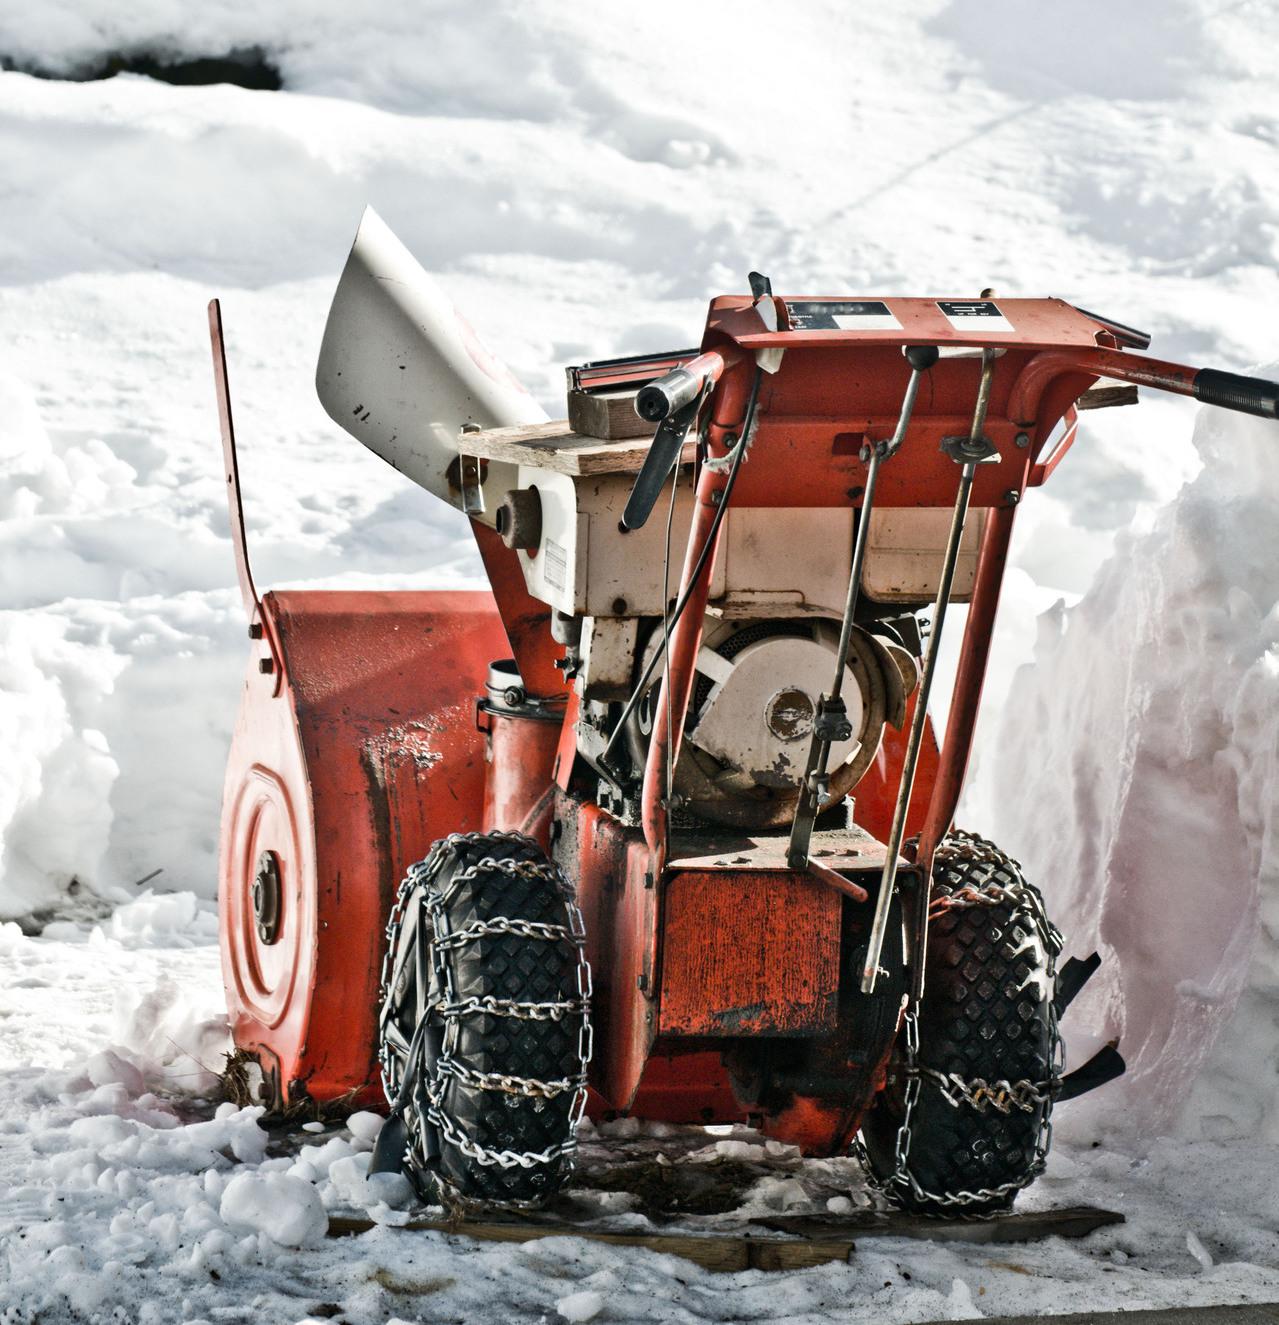 Tire chains snowblower